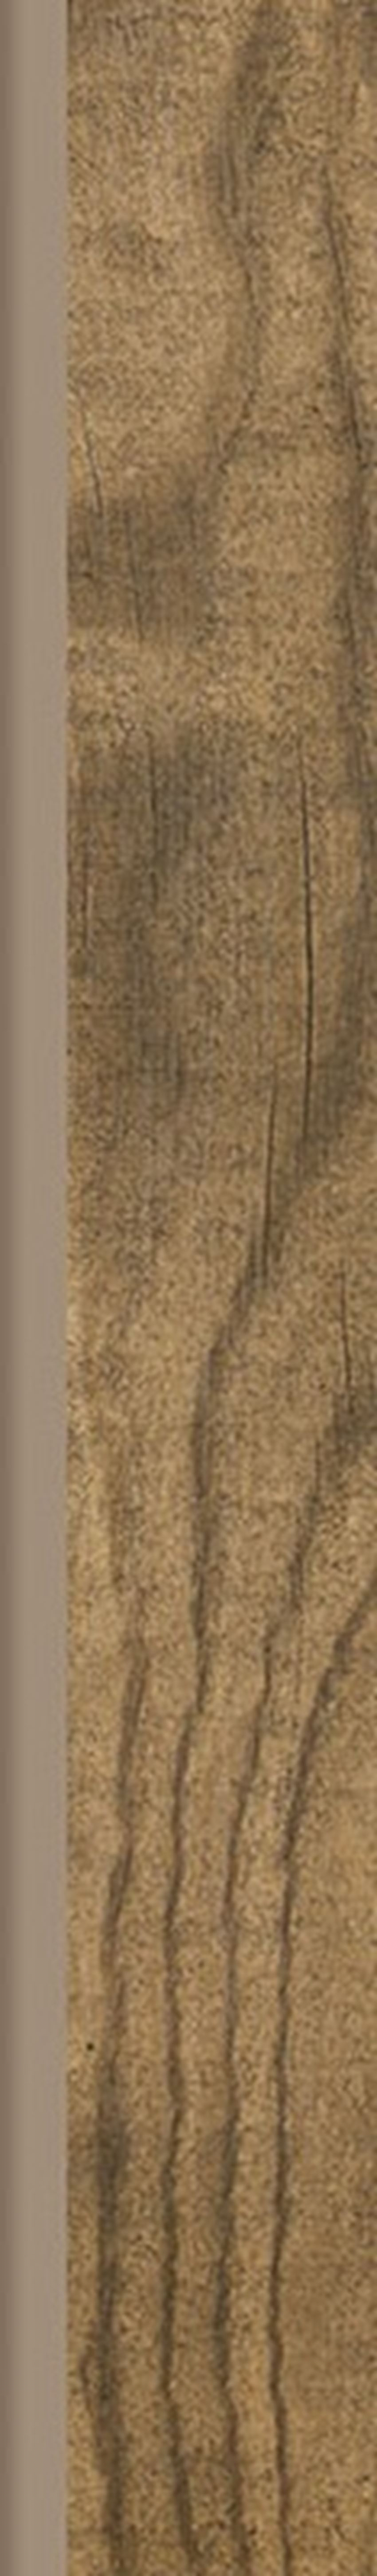 Płytka cokołowa 7,2x49,1 cm Paradyż Hilton Ochra Cokół Mat